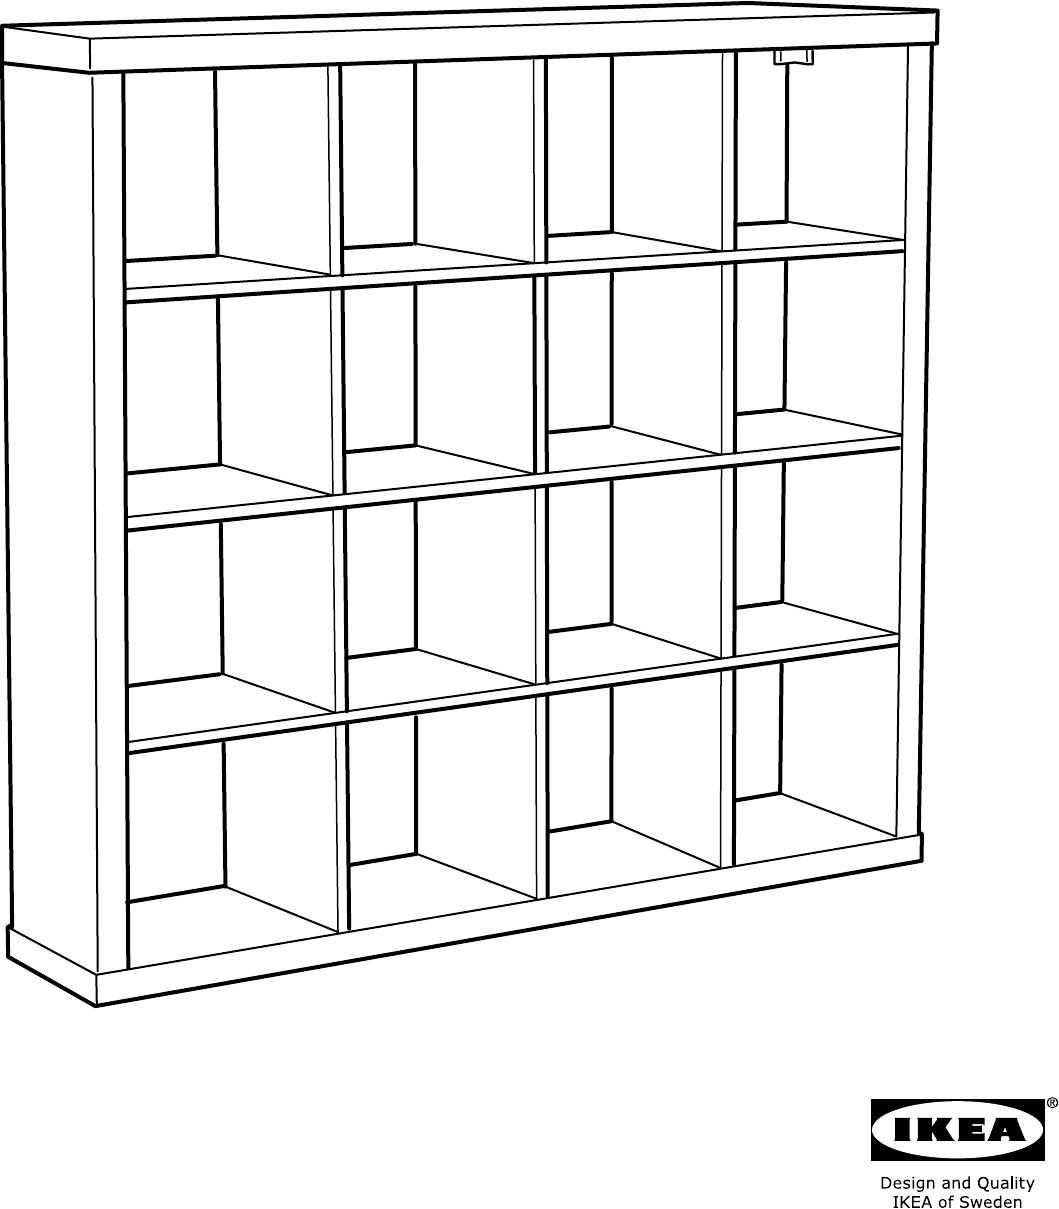 Schreibtisch Ikea Weiß Billig ~ Handleiding Ikea EXPEDIT Open kast (pagina 1 van 24) (Alle talen)